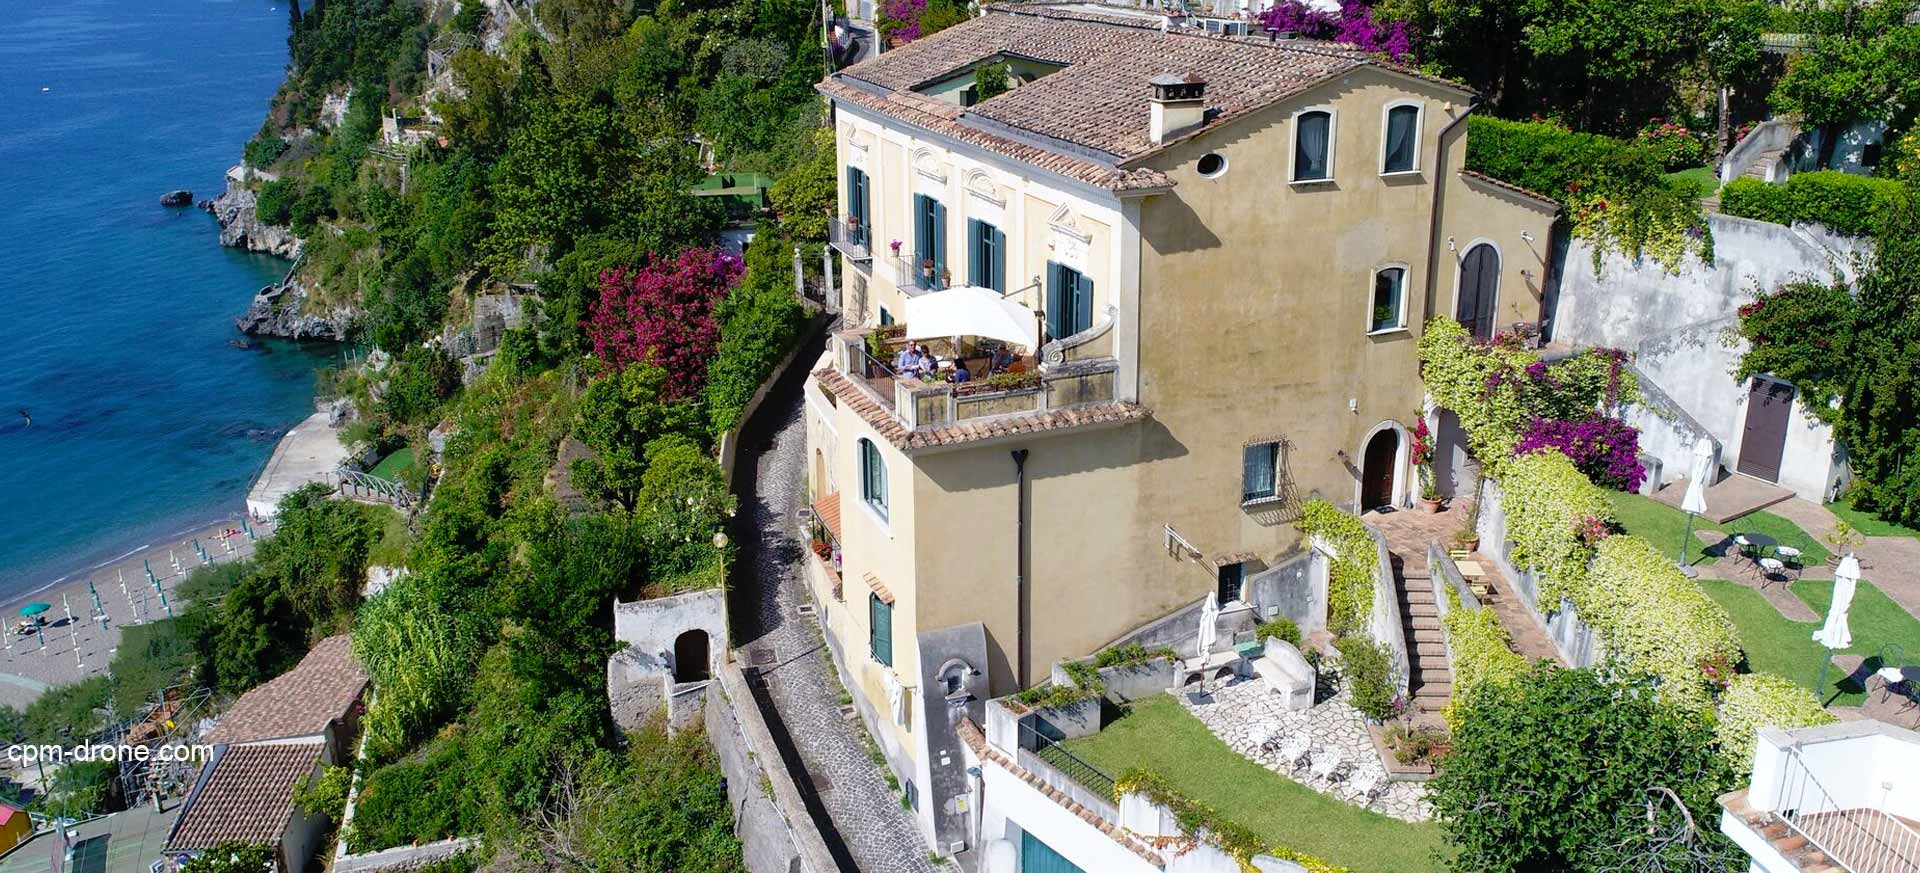 naples c te amalfitaine chambres d 39 h tes et hotels de charme hote italia. Black Bedroom Furniture Sets. Home Design Ideas